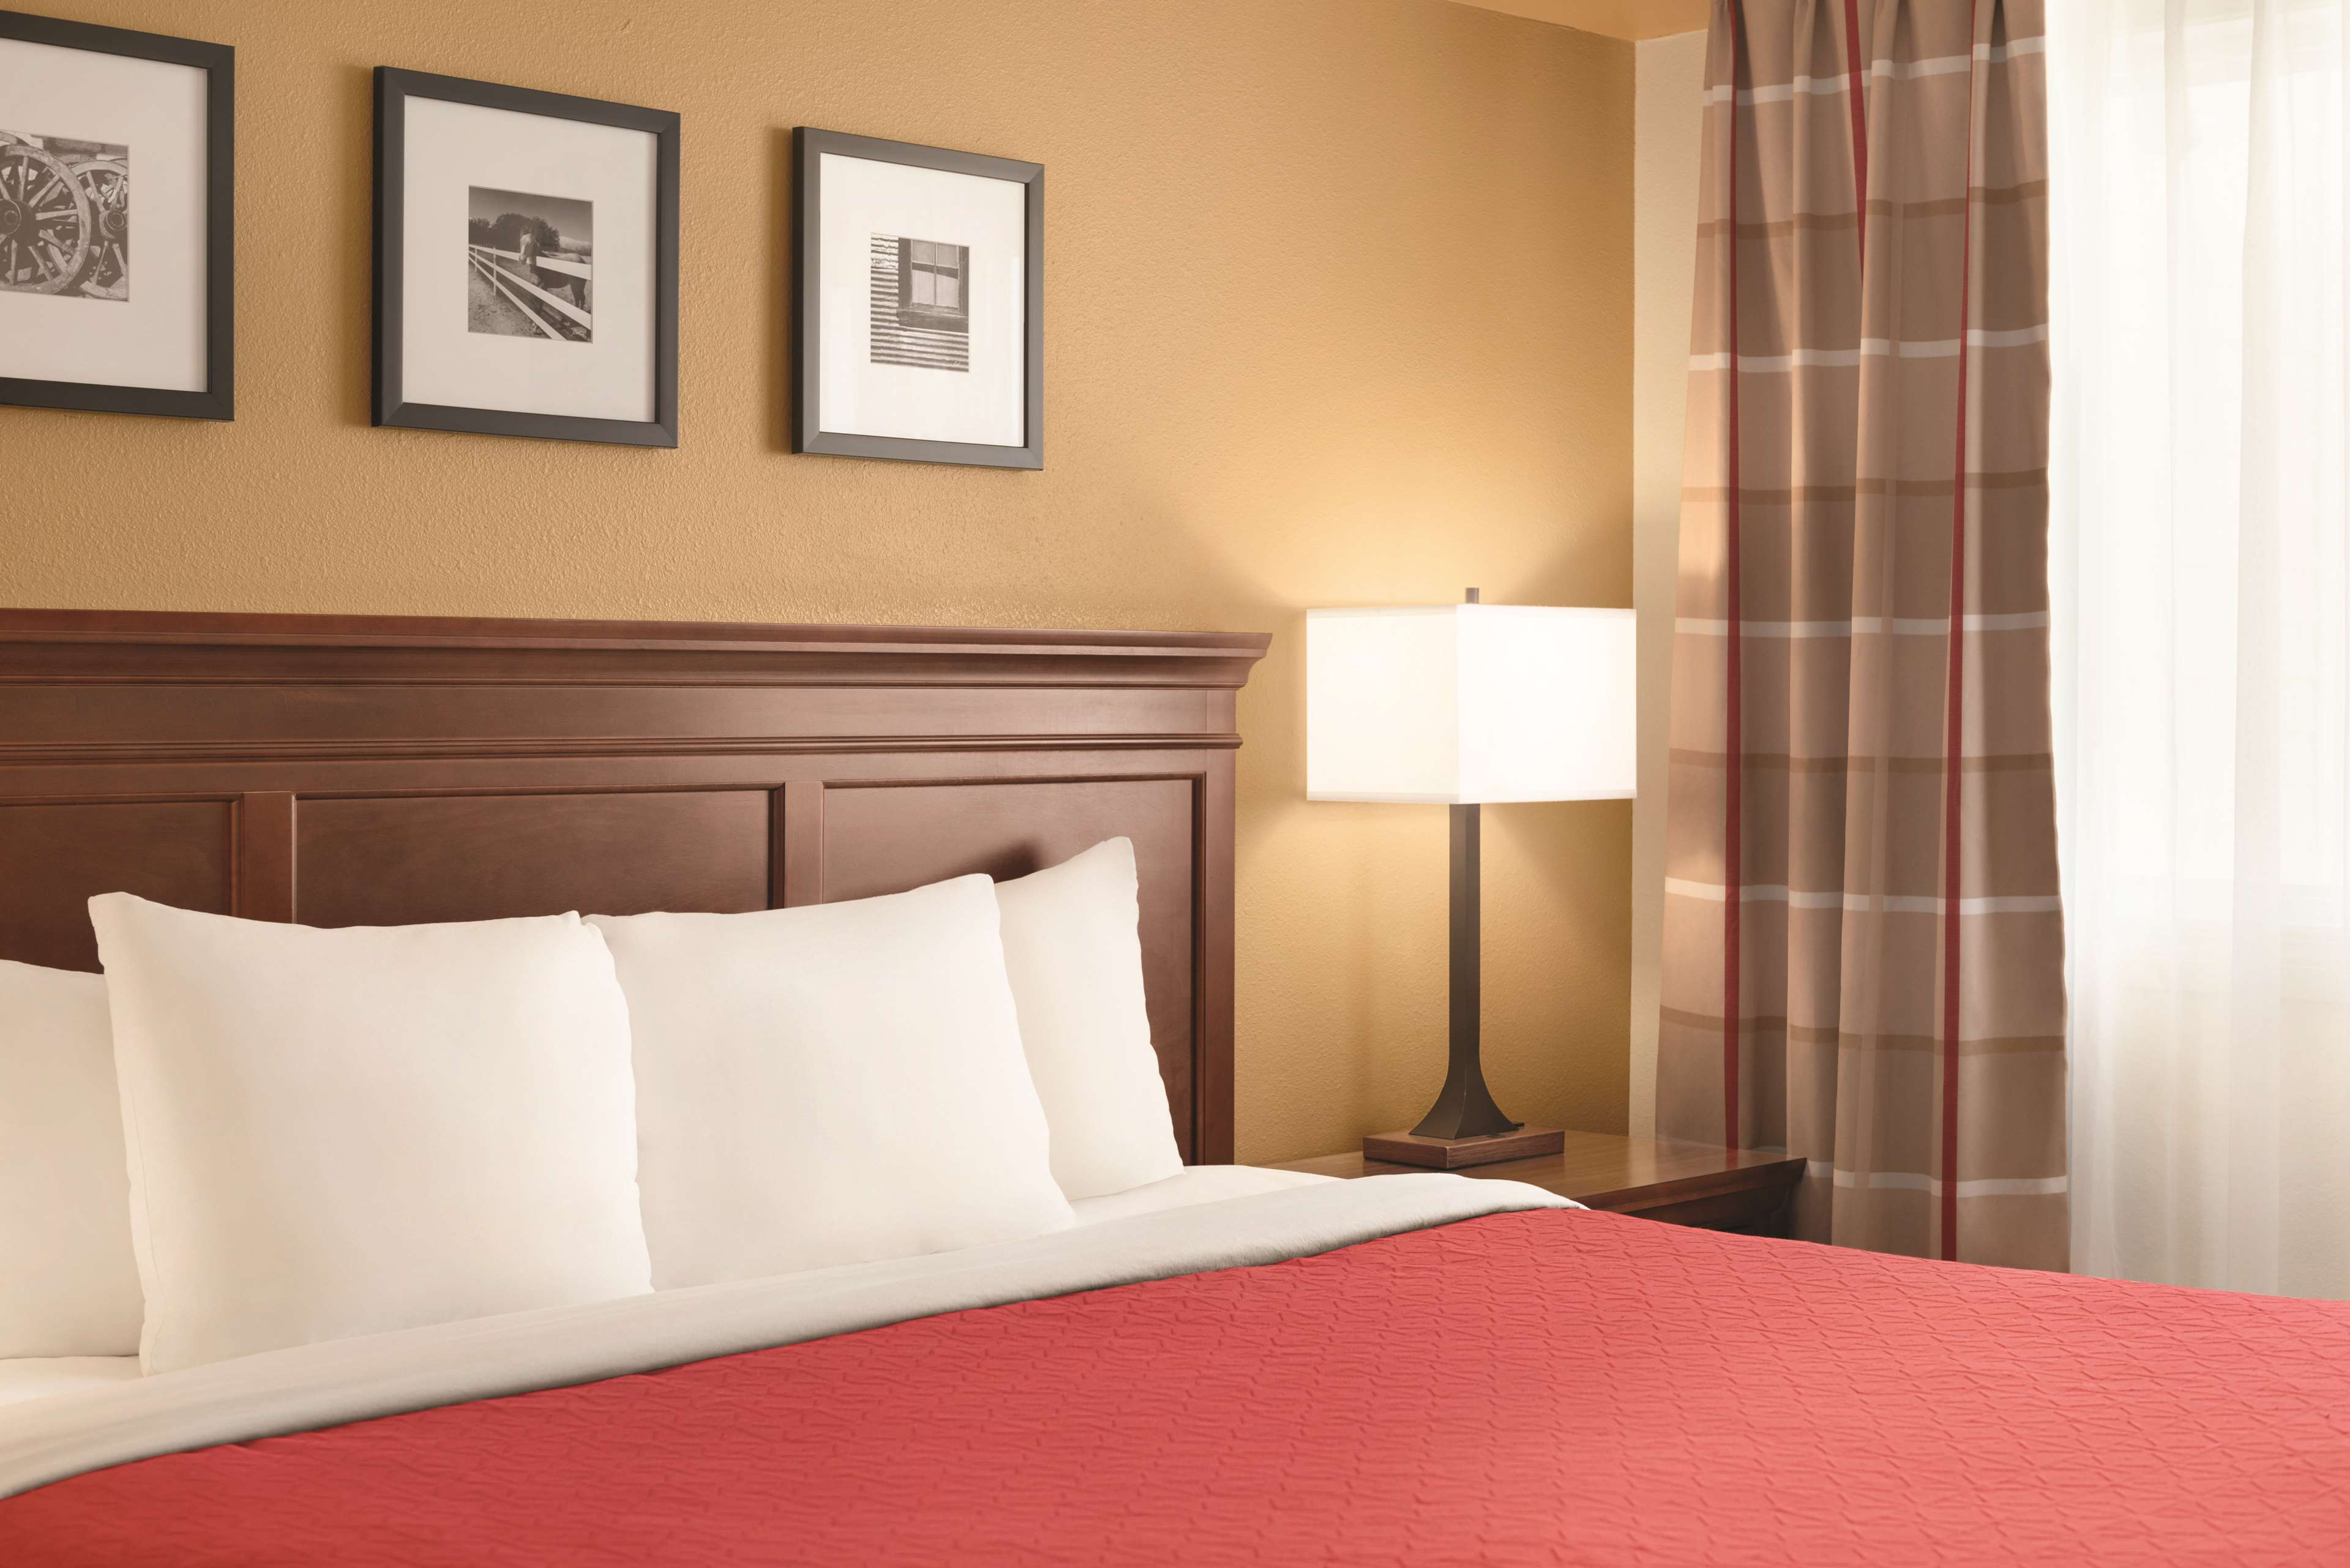 Country Inn & Suites by Radisson, Saskatoon, SK in Saskatoon: 1 Bedroom Suite-King Bed